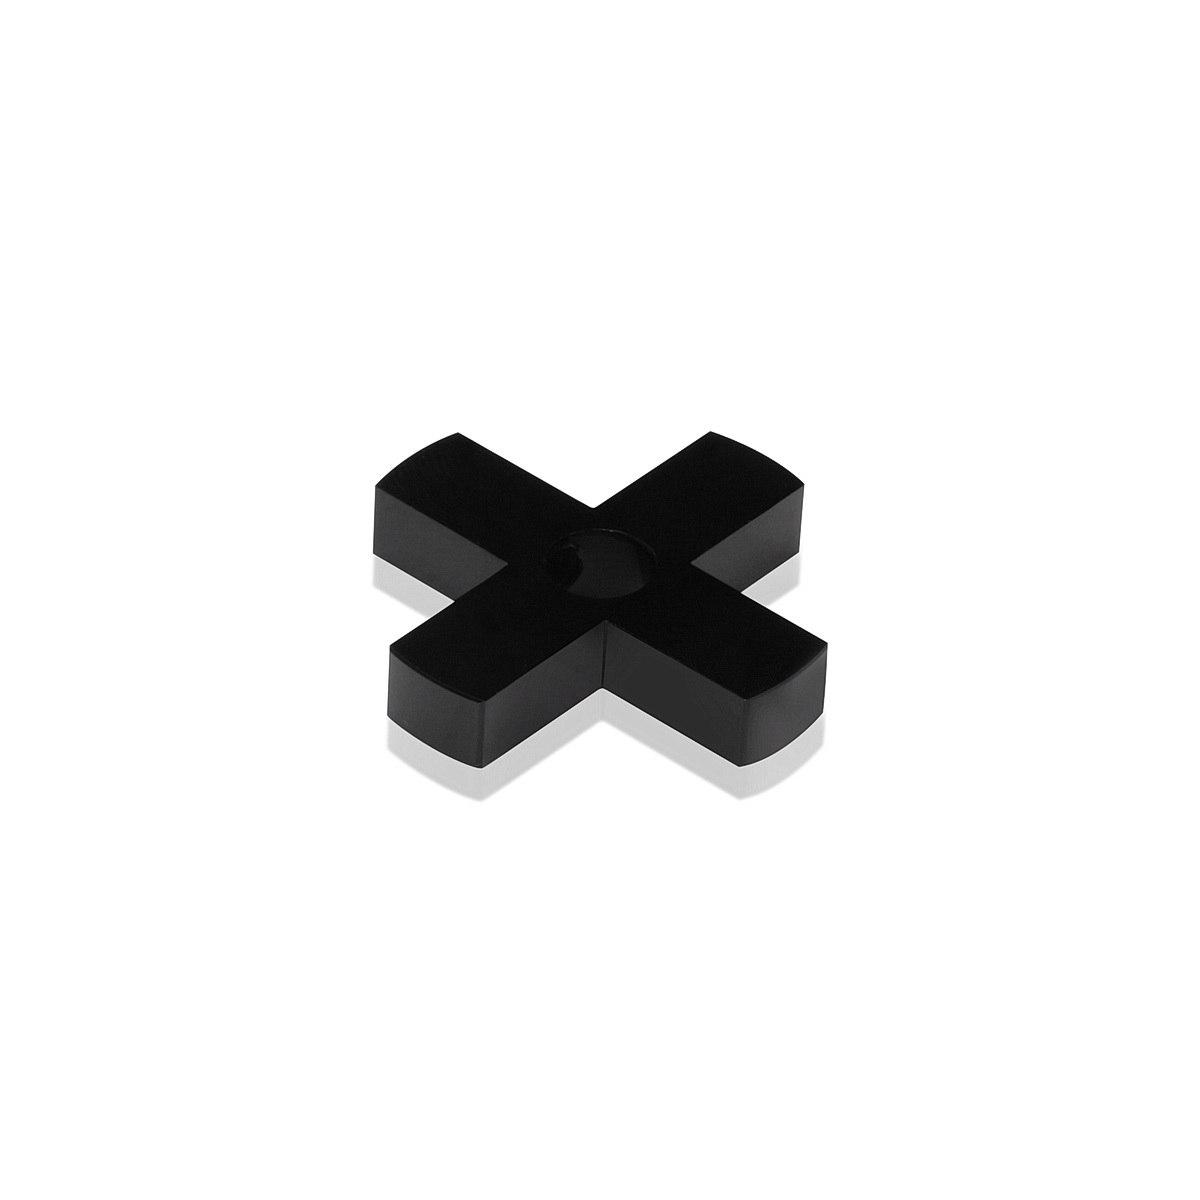 4-Way Standoffs Hub, Diameter: 1 1/2'', Thickness: 1/4'', Black Anodized Aluminum